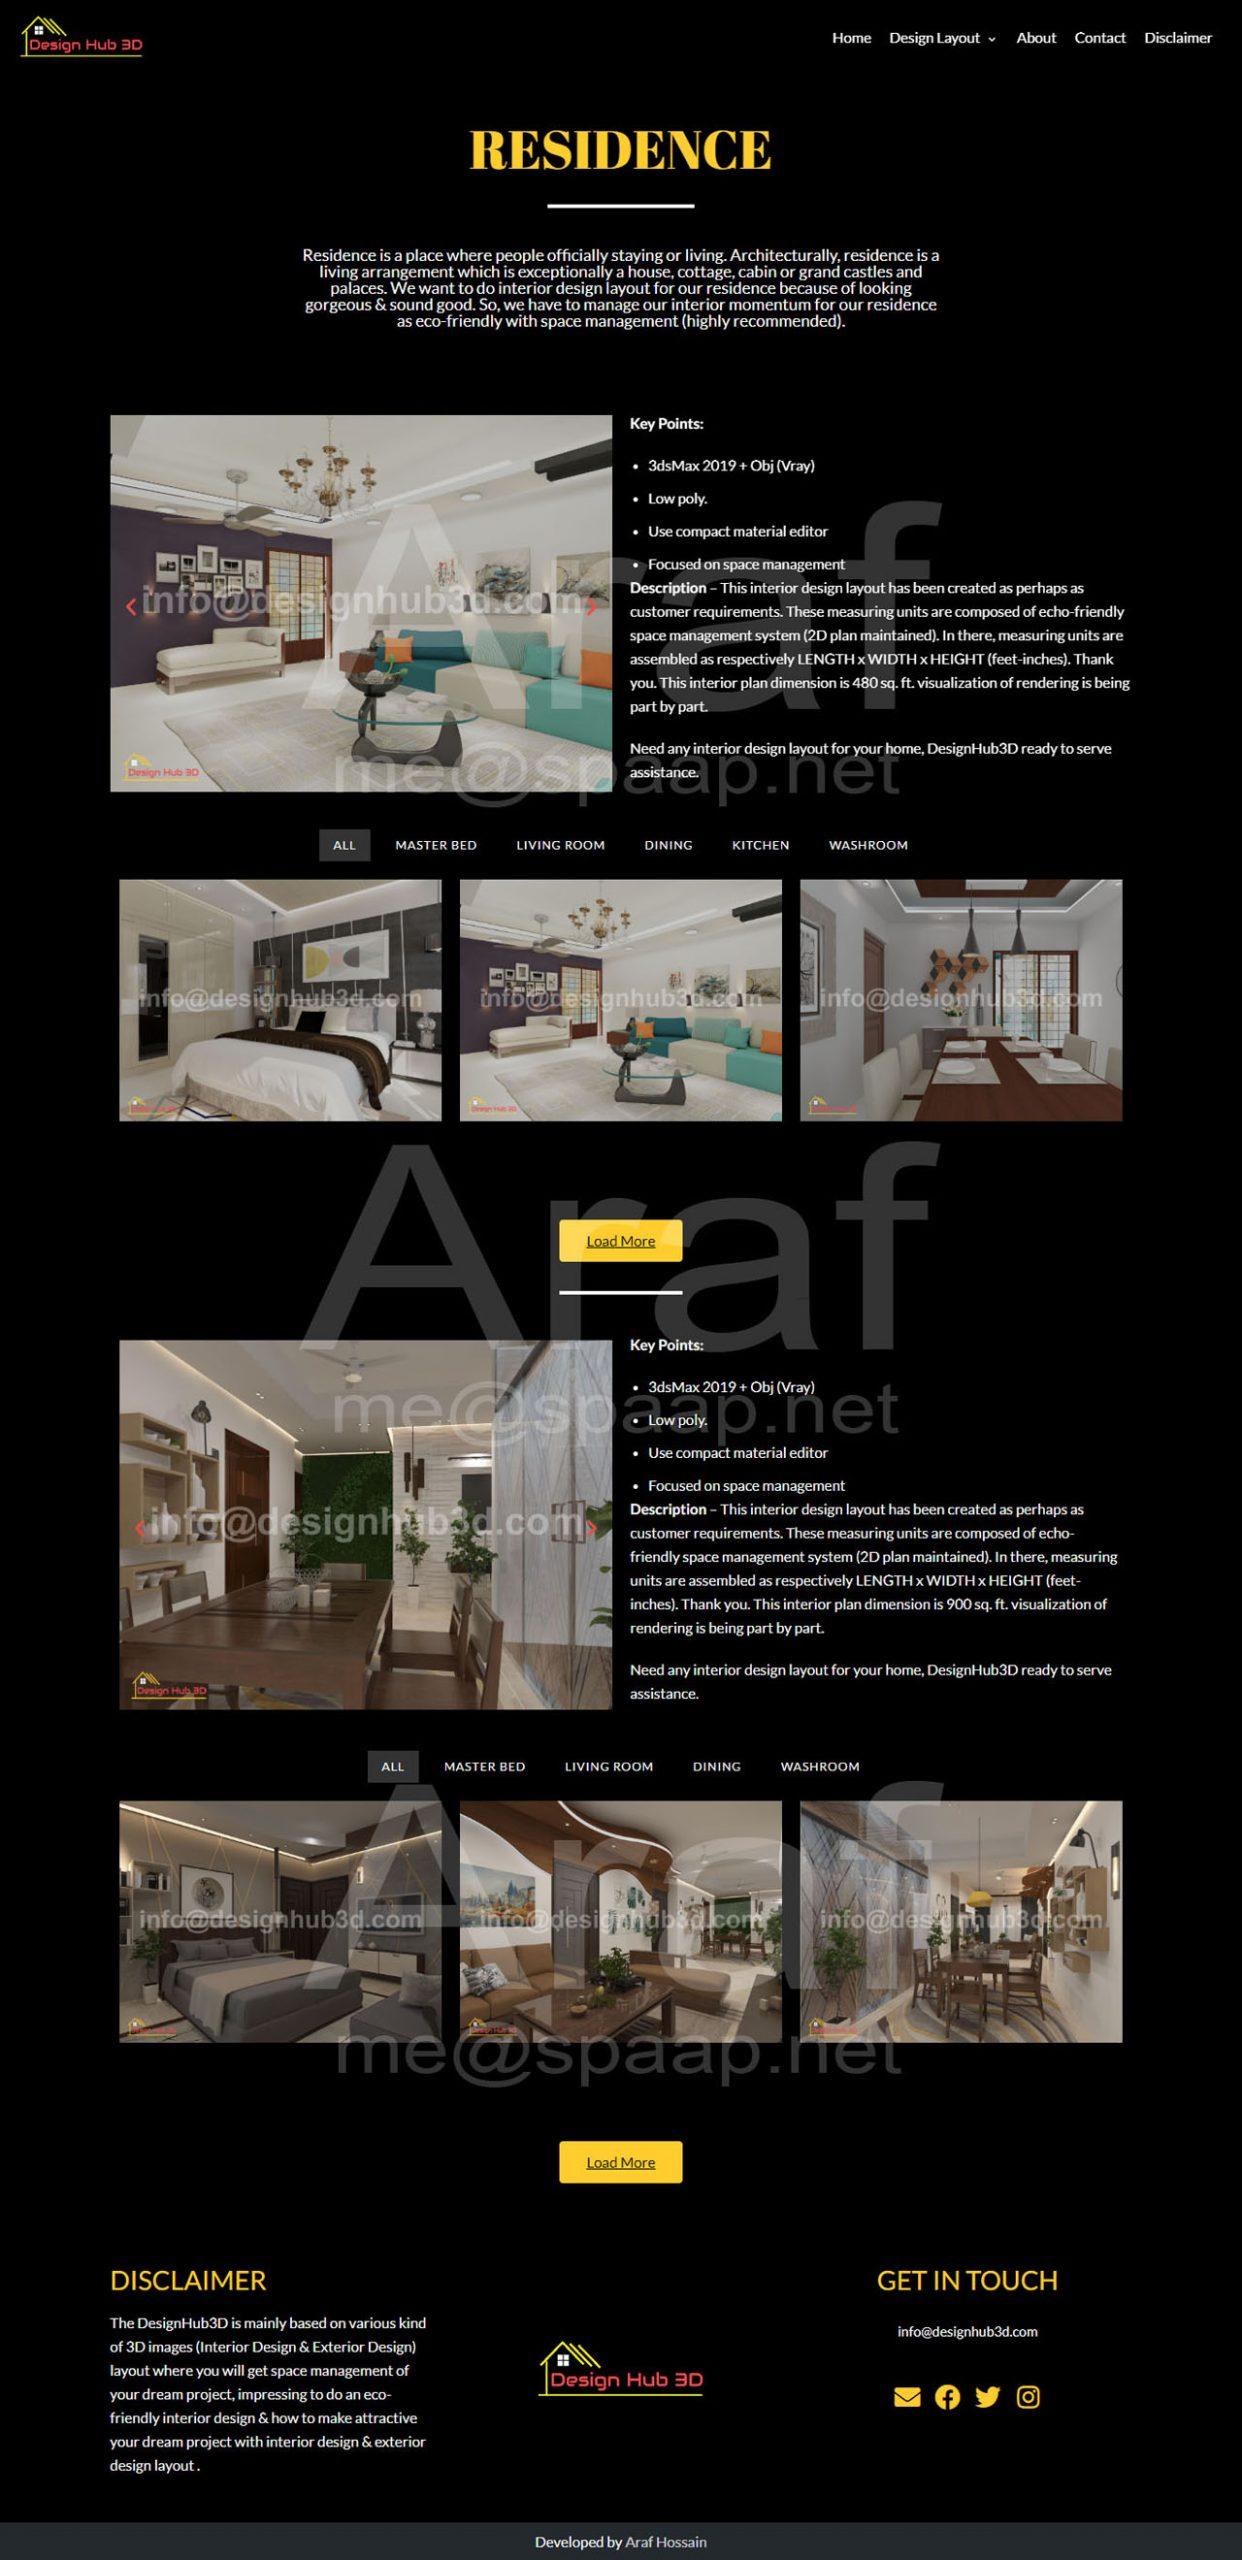 Araf Hossain - DesignHub 3D Layout